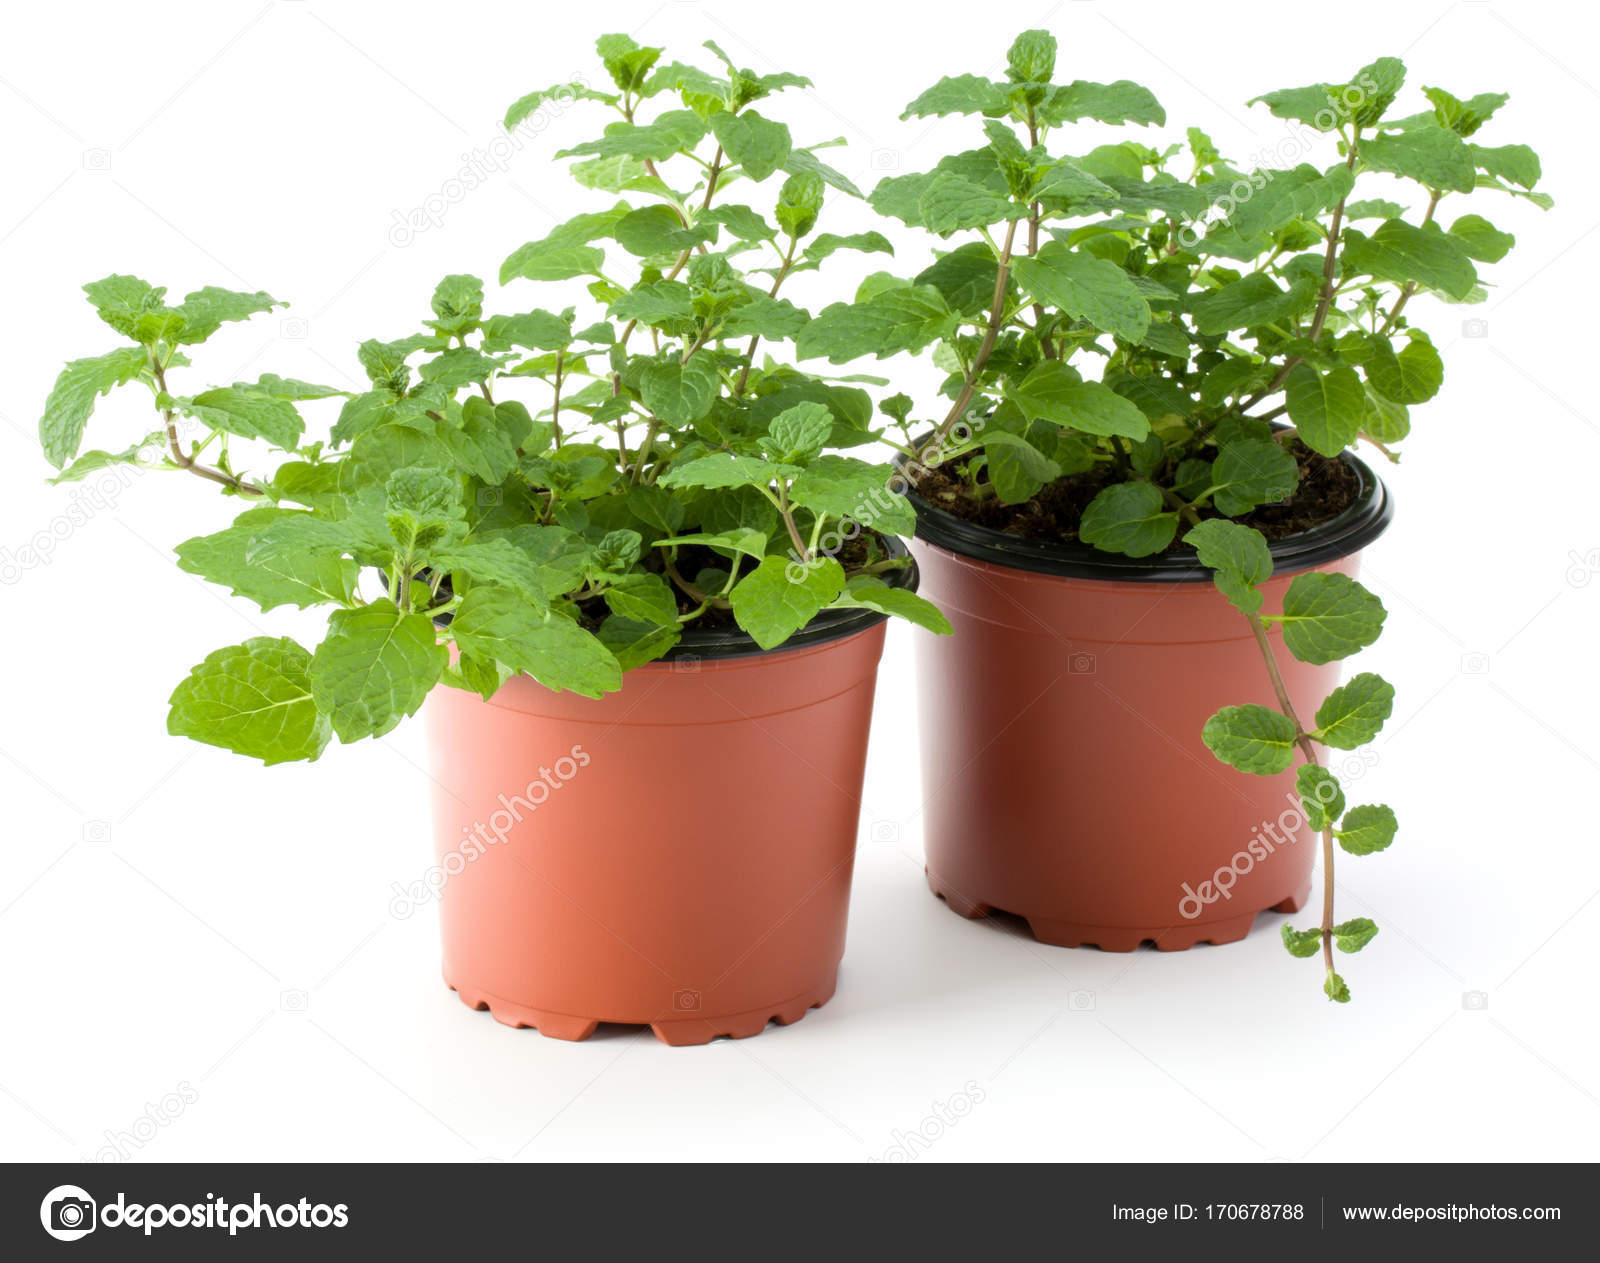 Erba aromatica menta piperita crescere in vasi da fiori for Vasi erba